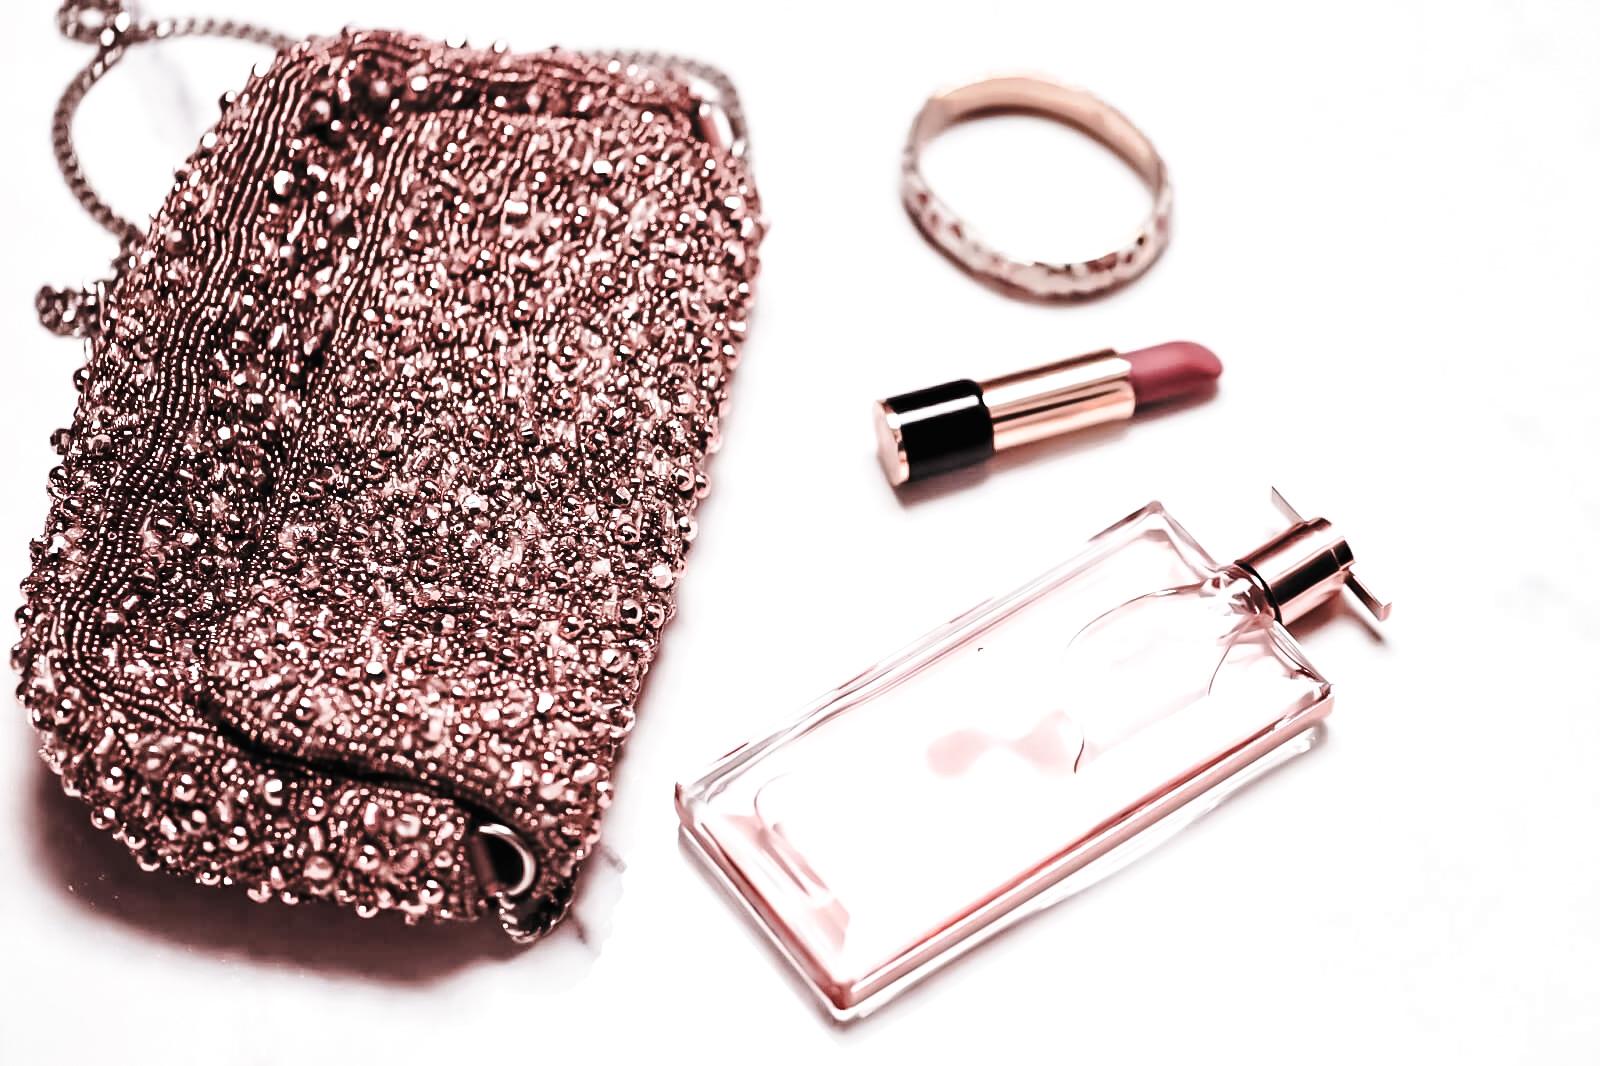 Lancome Idole Parfum Avis